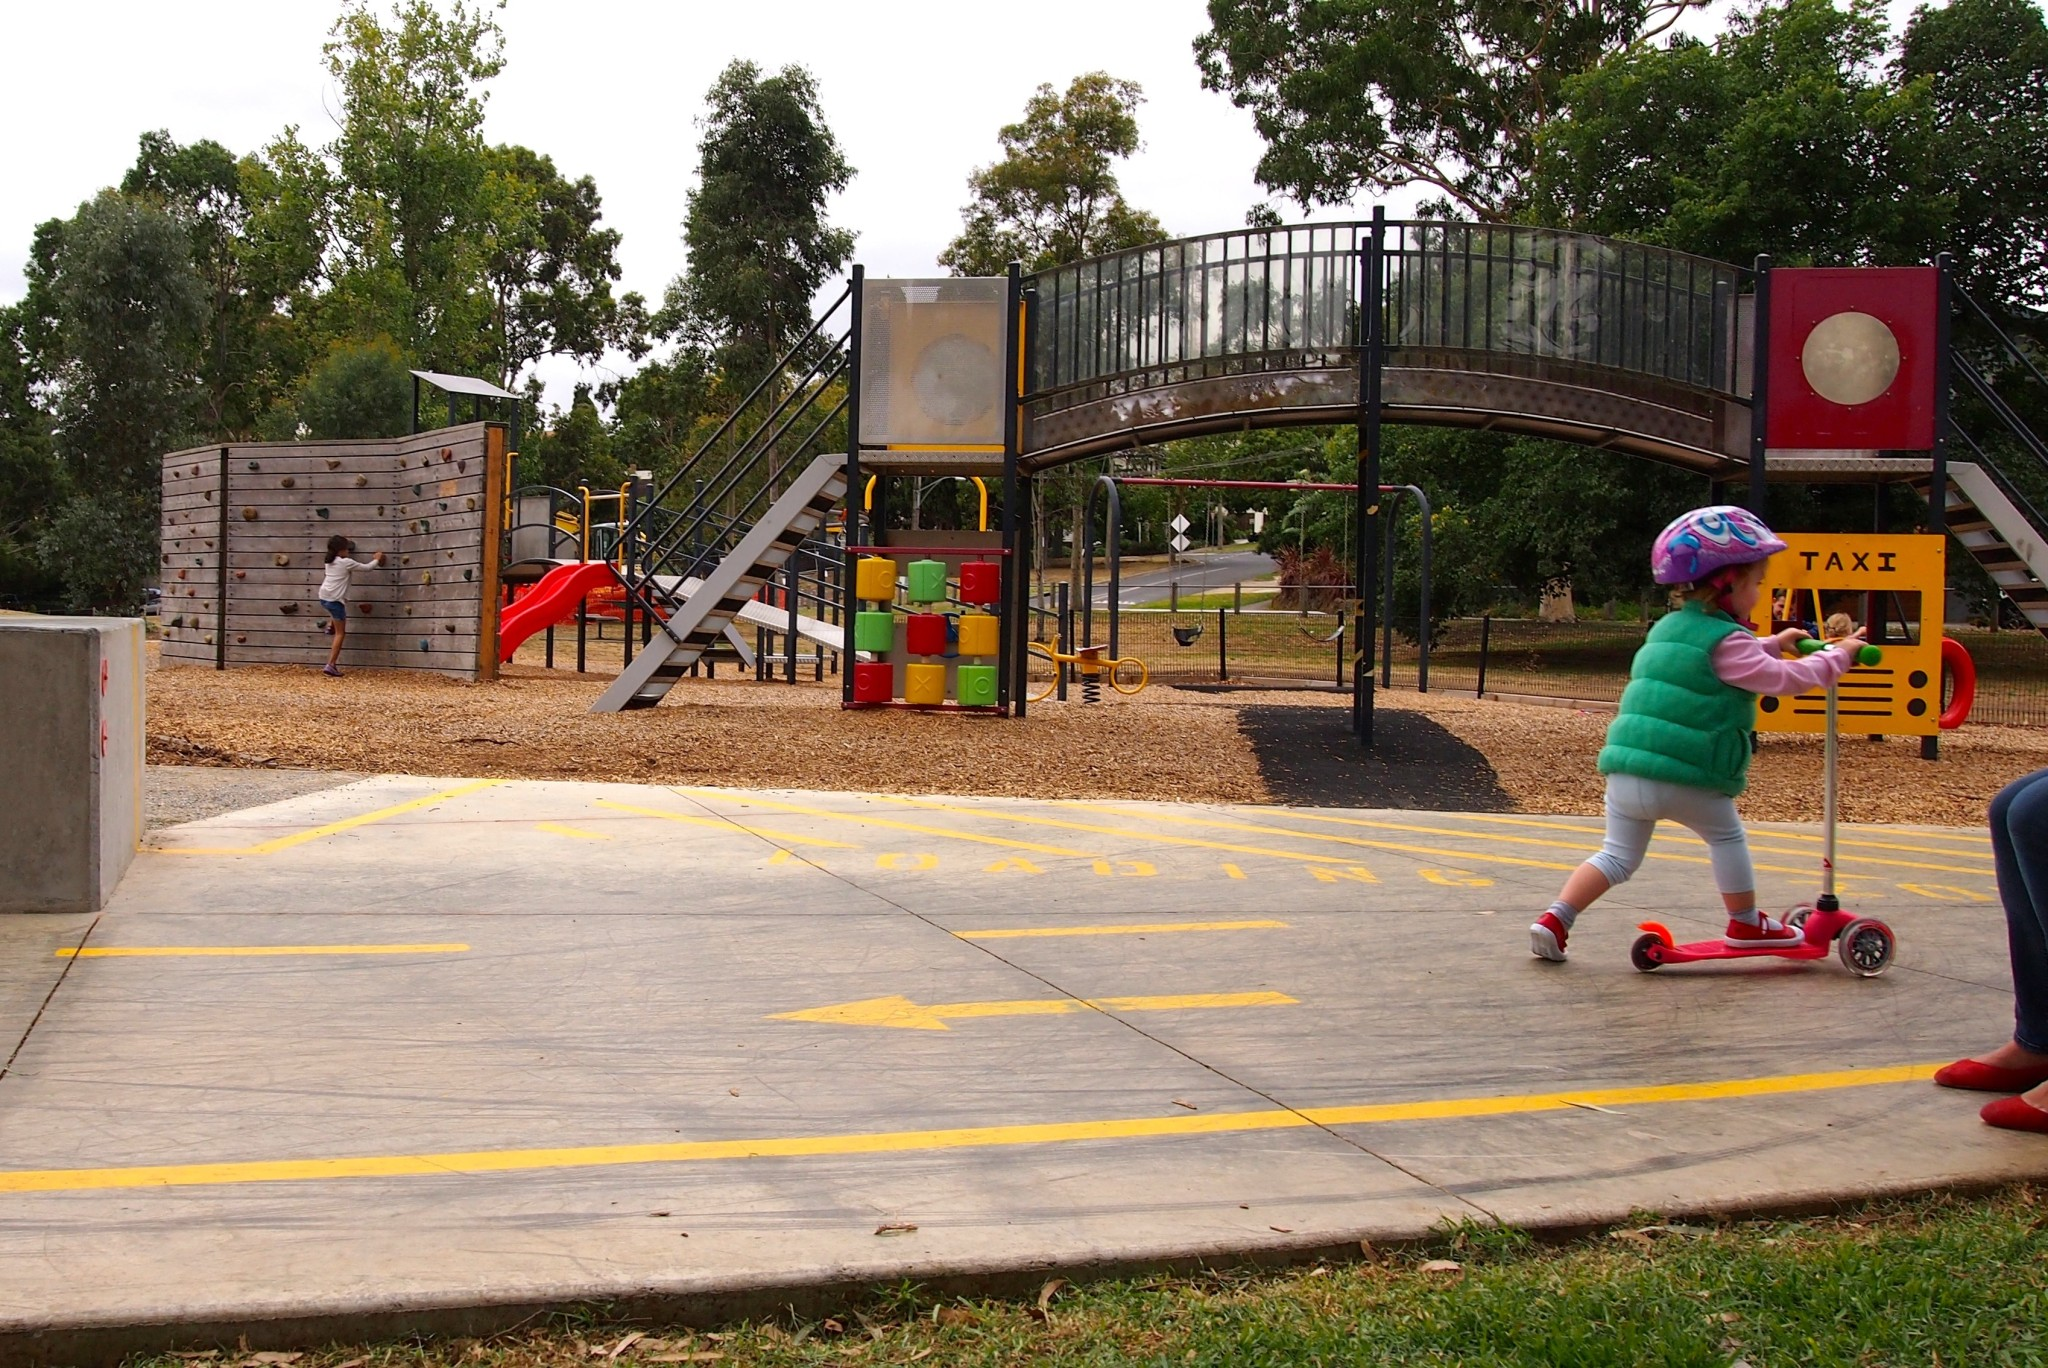 Beginners skate & BMX playground